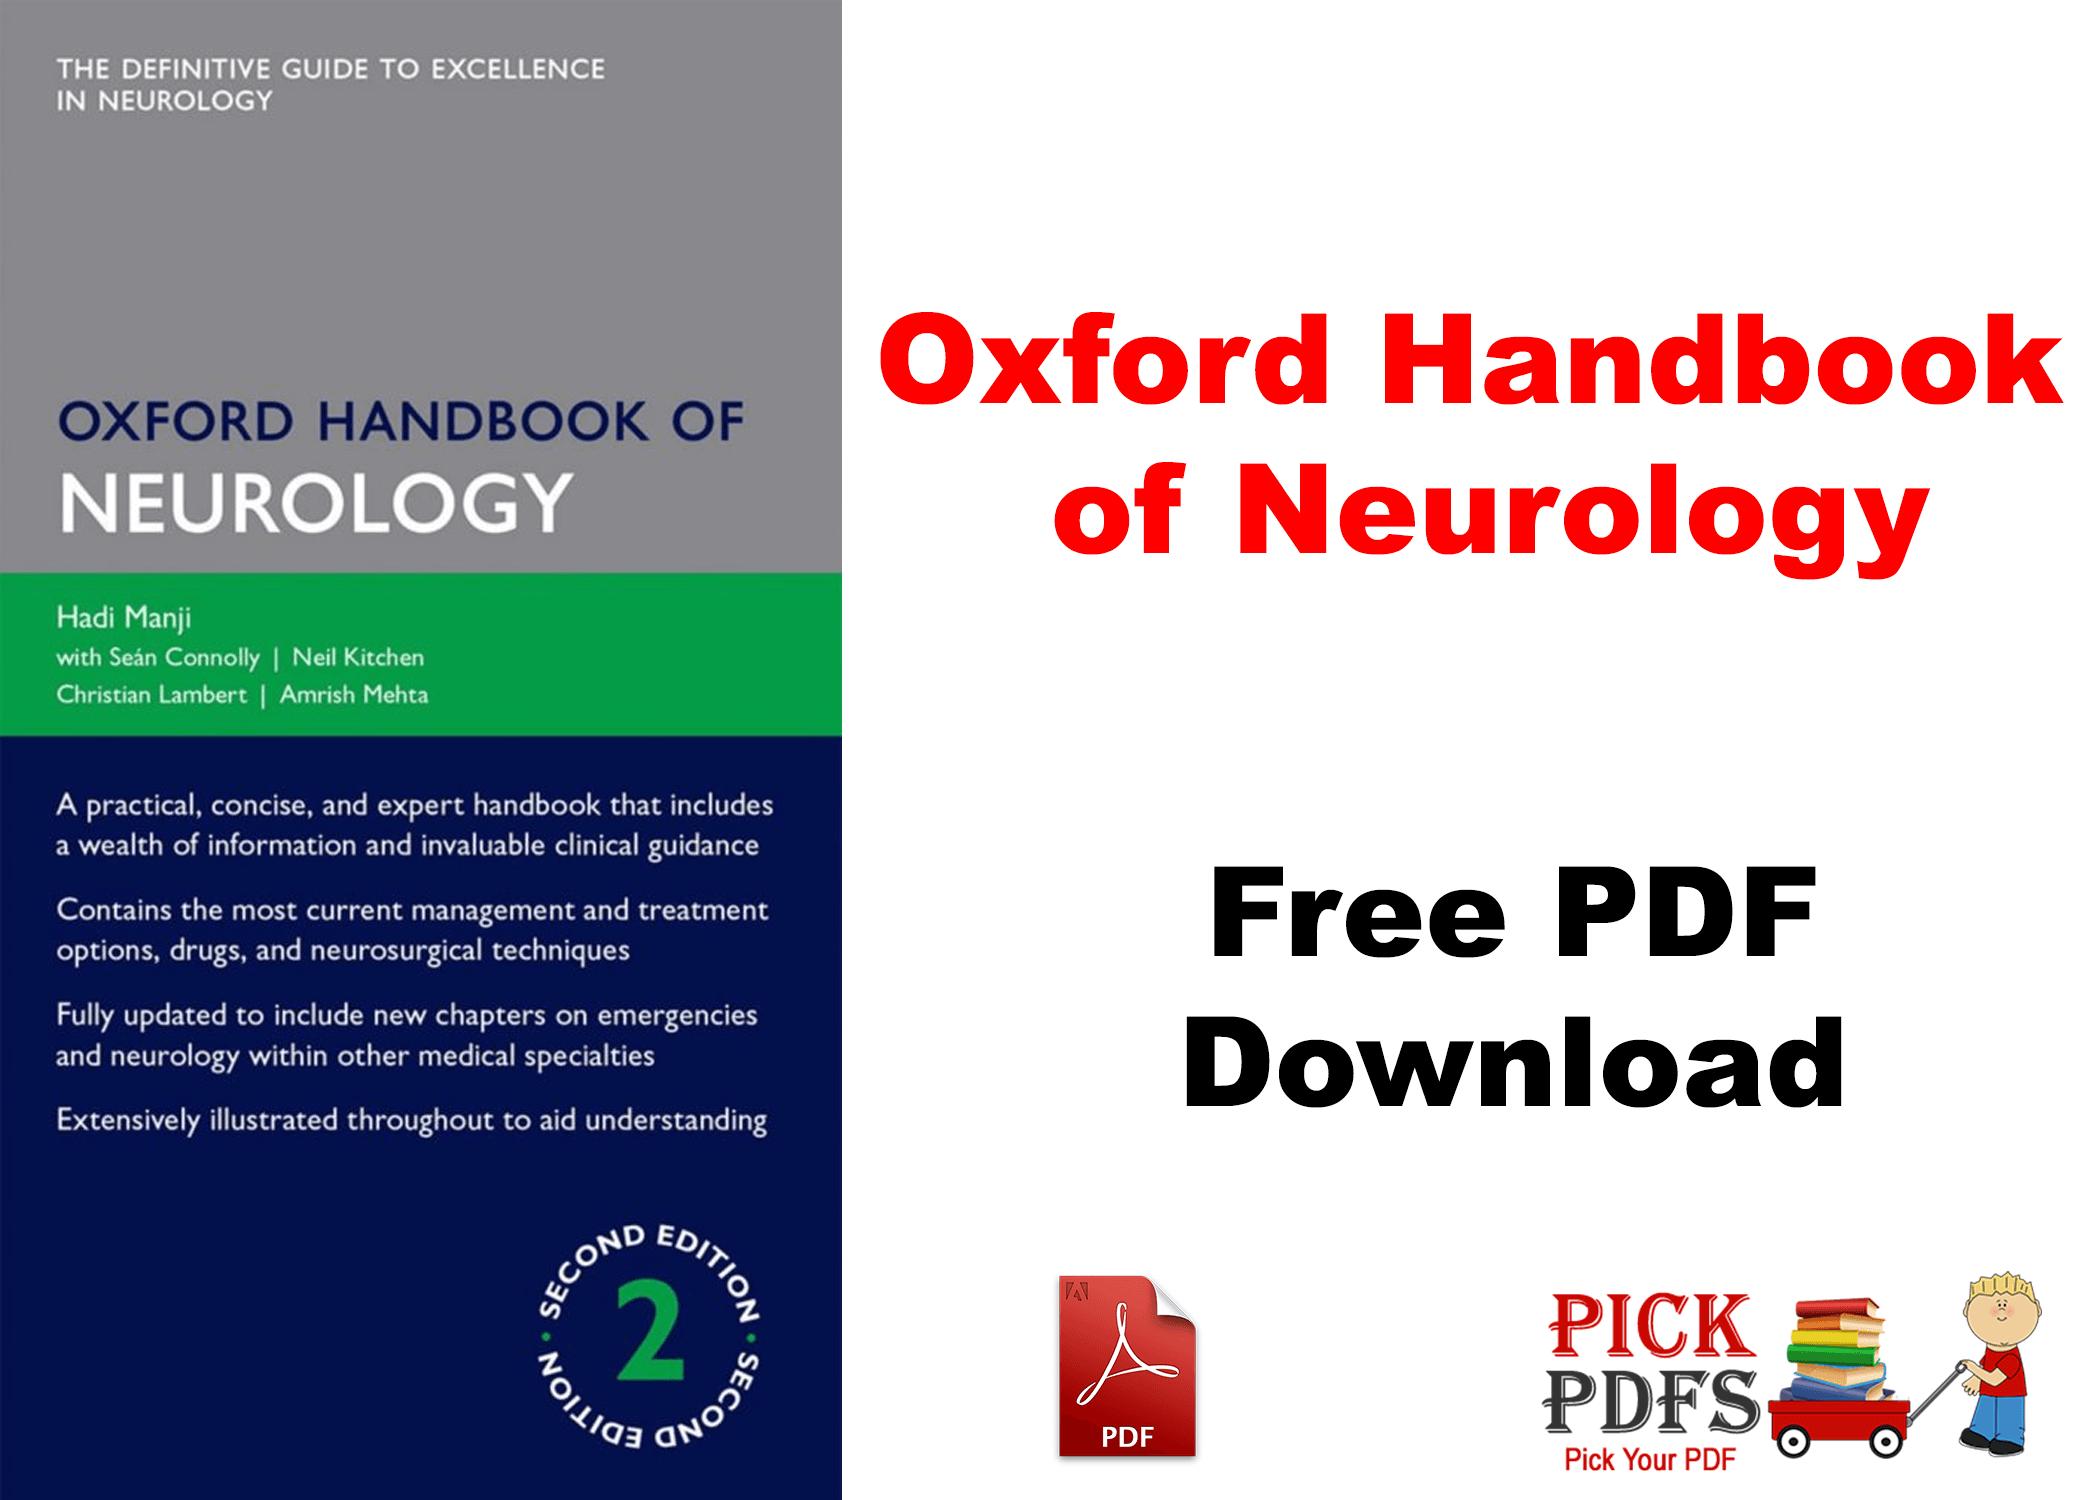 https://pickpdfs.com/oxford-handbook-of-neurology-free-pdf-2nd-edition-download/